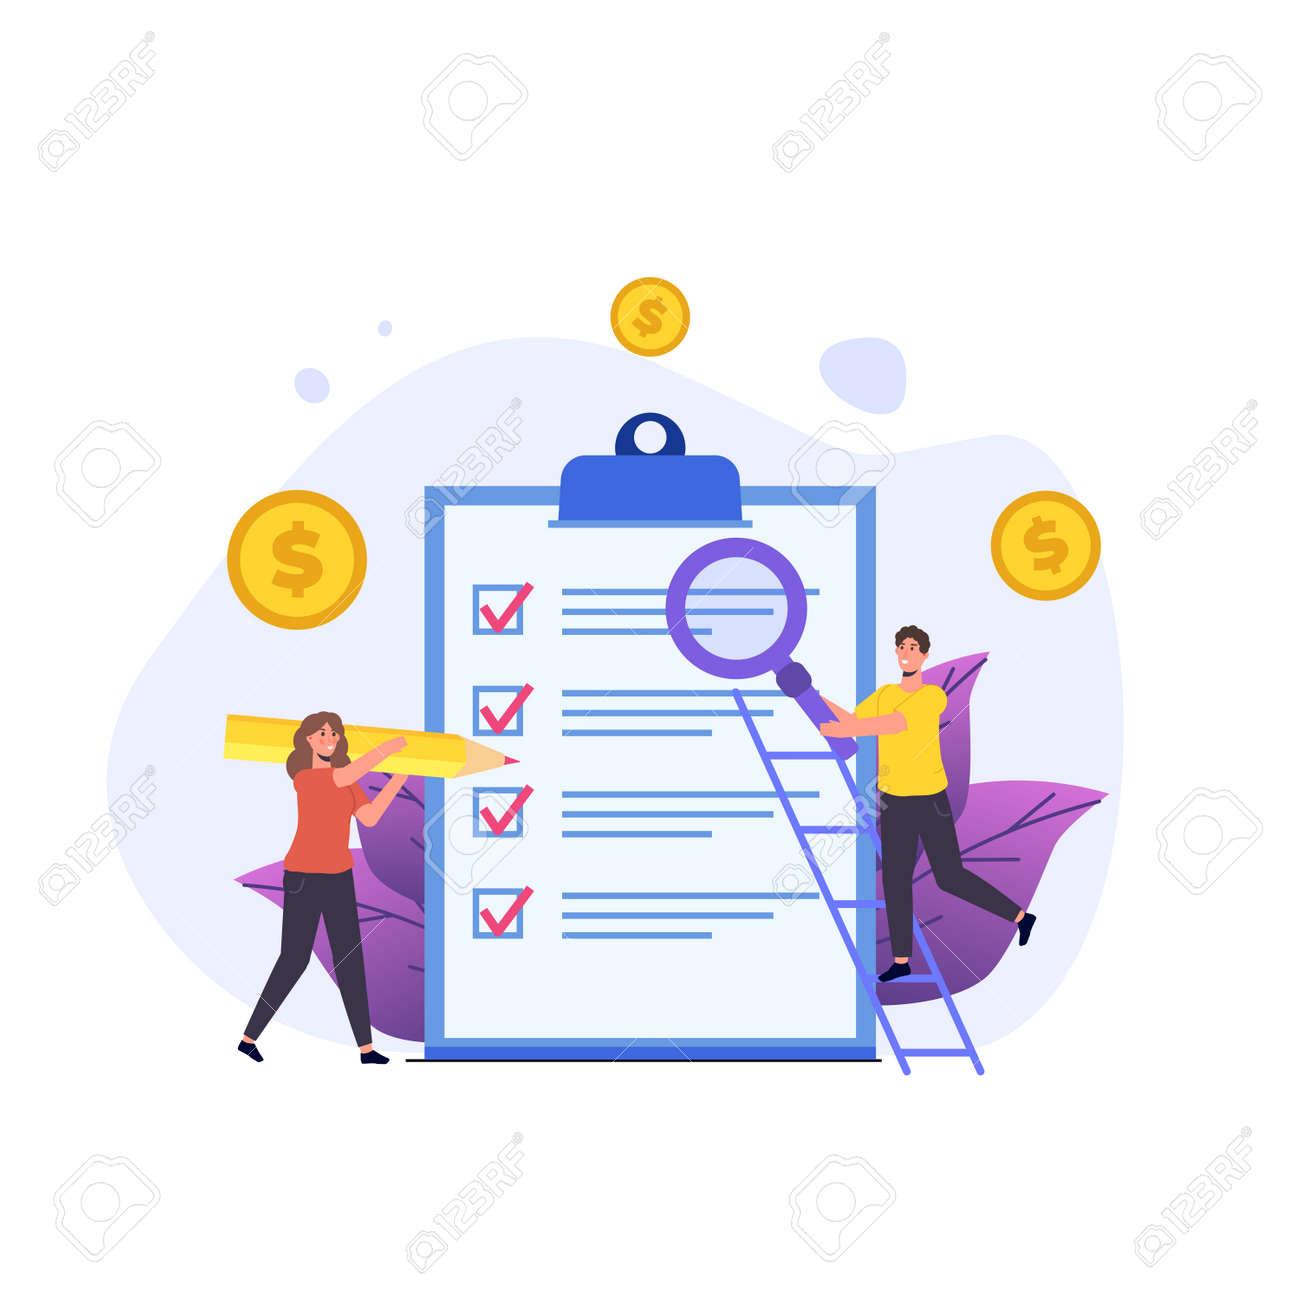 Budget planning, Balance financial, Retirement preparation, Calculating financial risk concept. Vector illustration. - 147812405